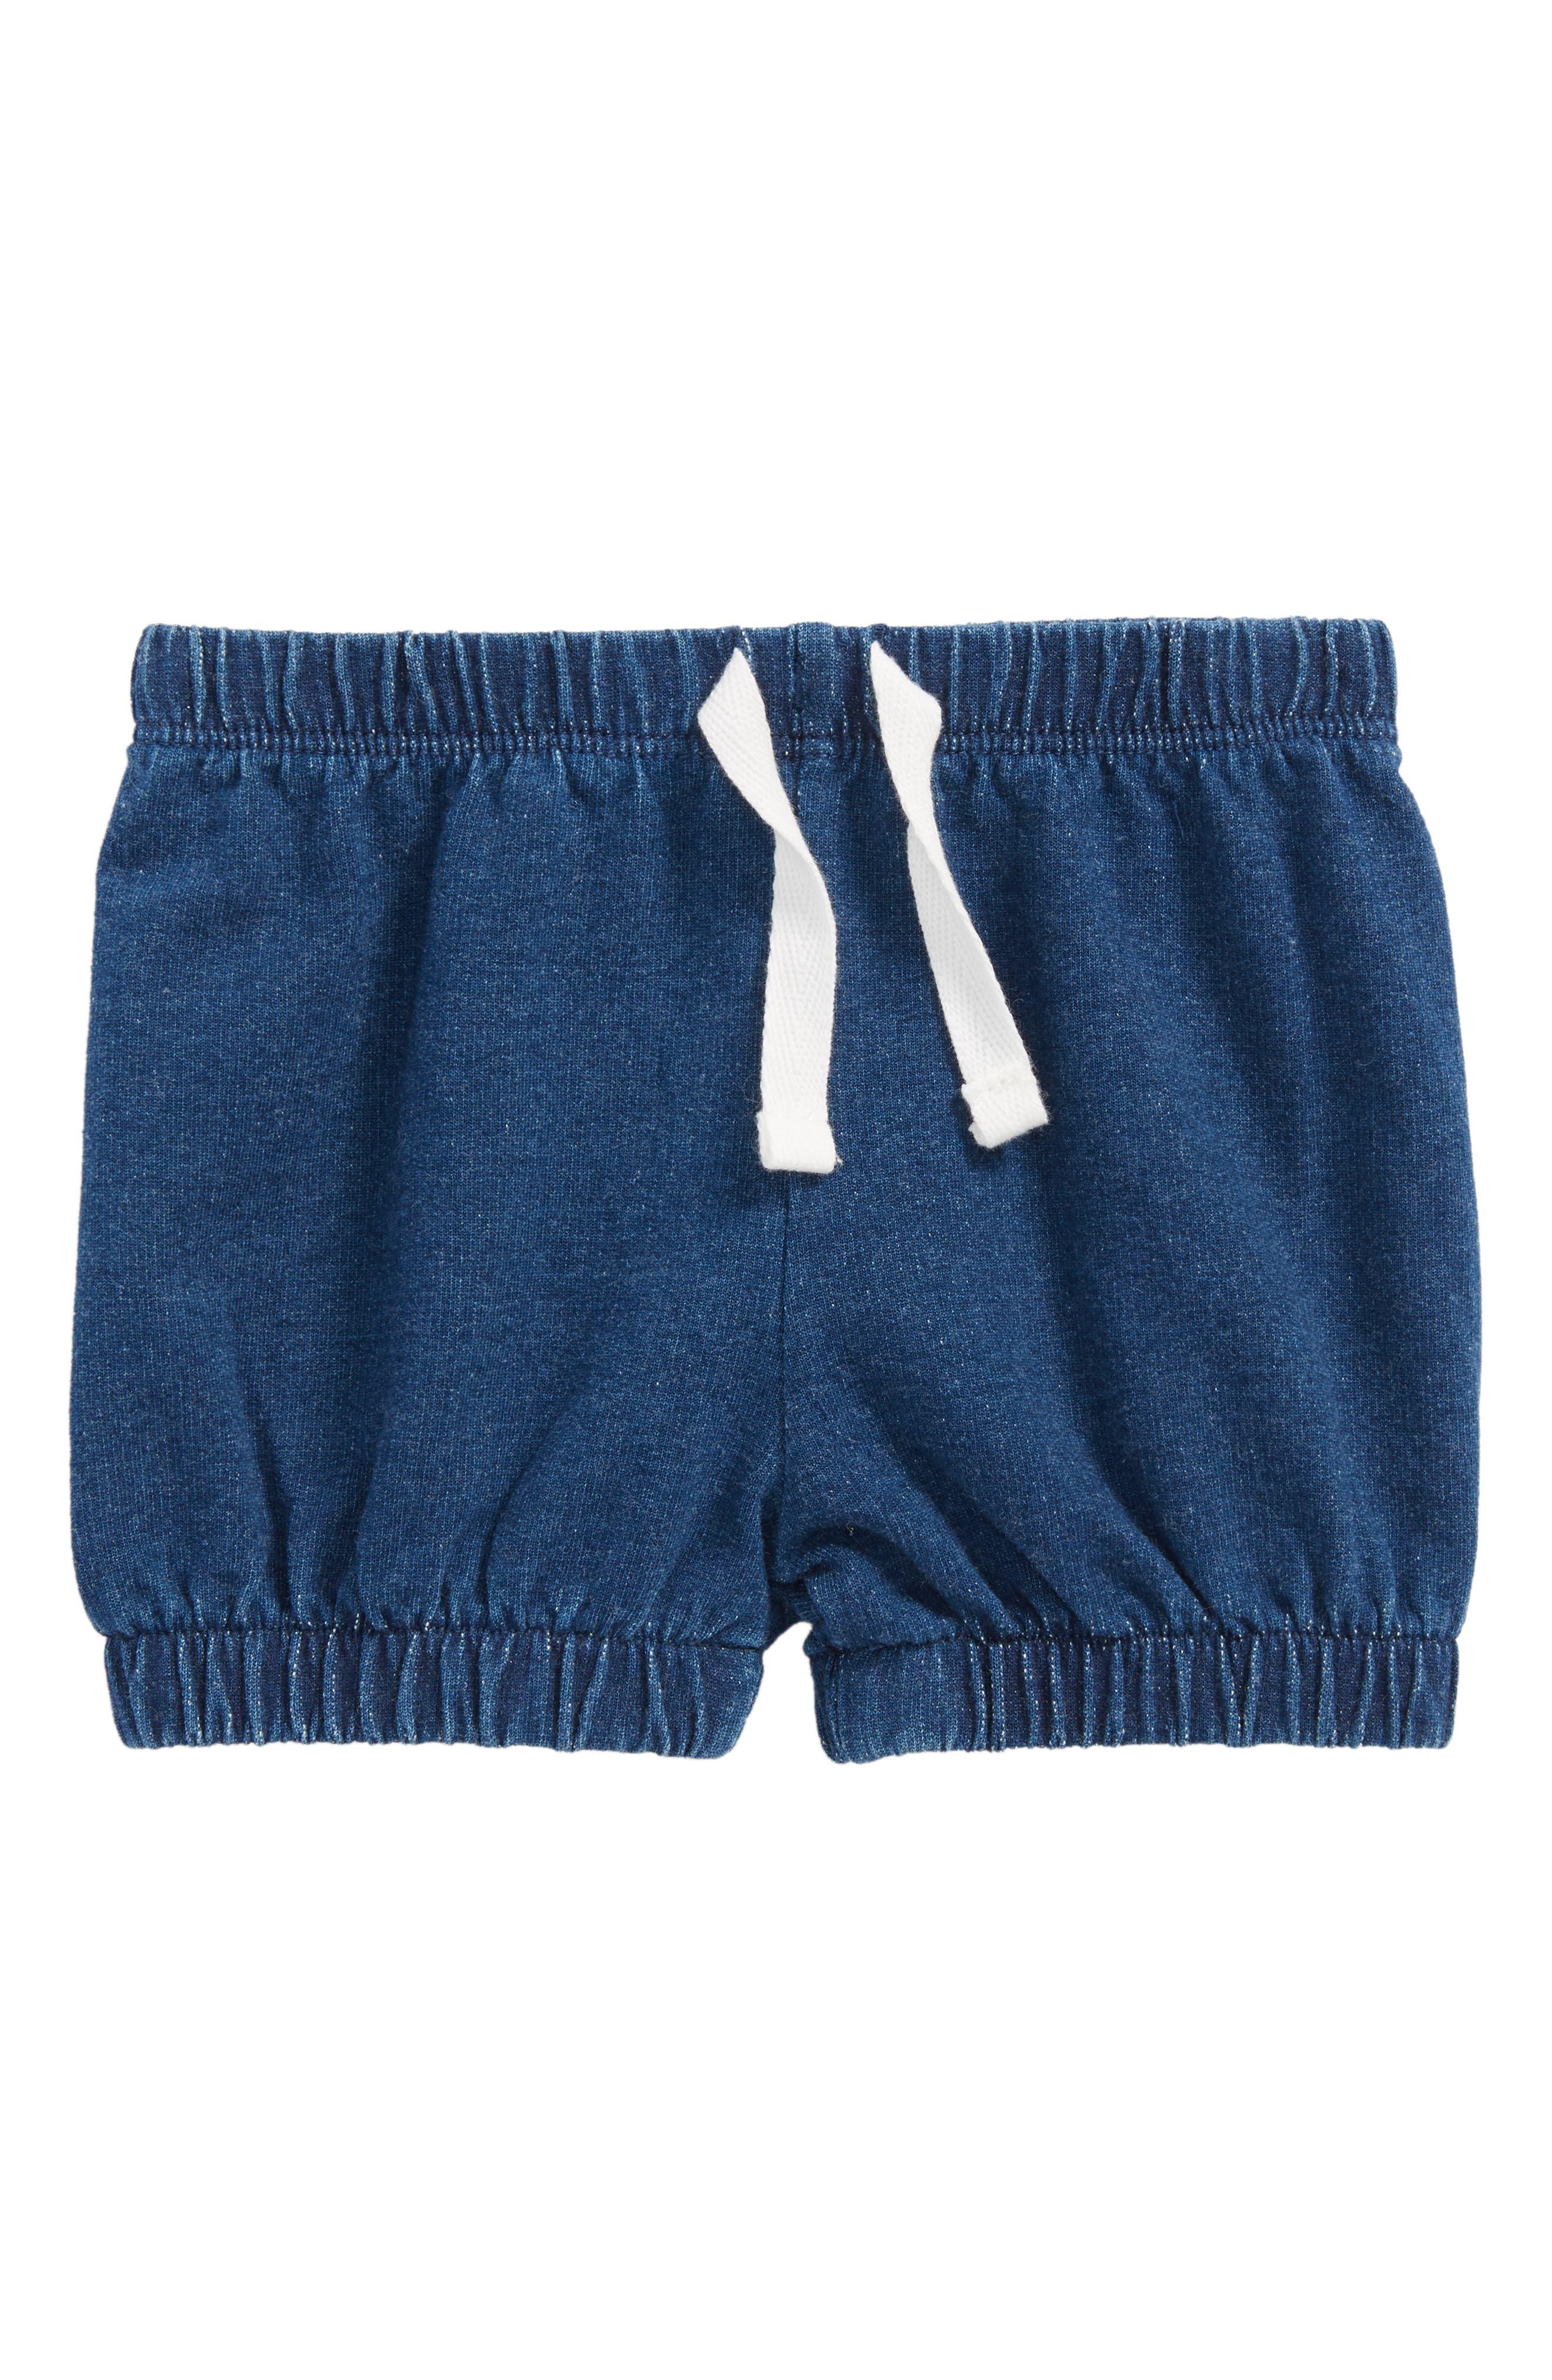 Bubble Shorts,                             Main thumbnail 1, color,                             Blue Denim